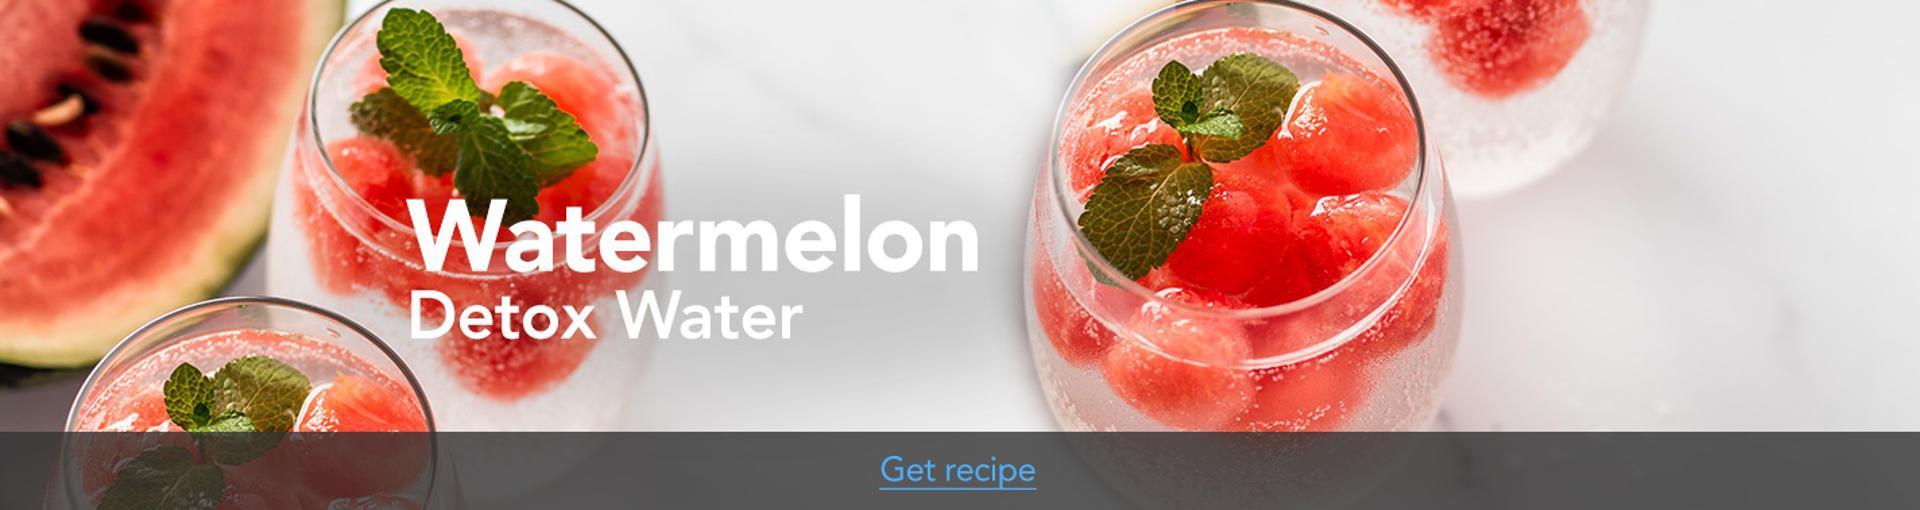 https://media.nedigital.sg/fairprice/images/d24ec76b-9f0b-4ee2-bad1-a41281368af6/Watermelon-Detox-Water-LandingBanner-Jul2020.jpg